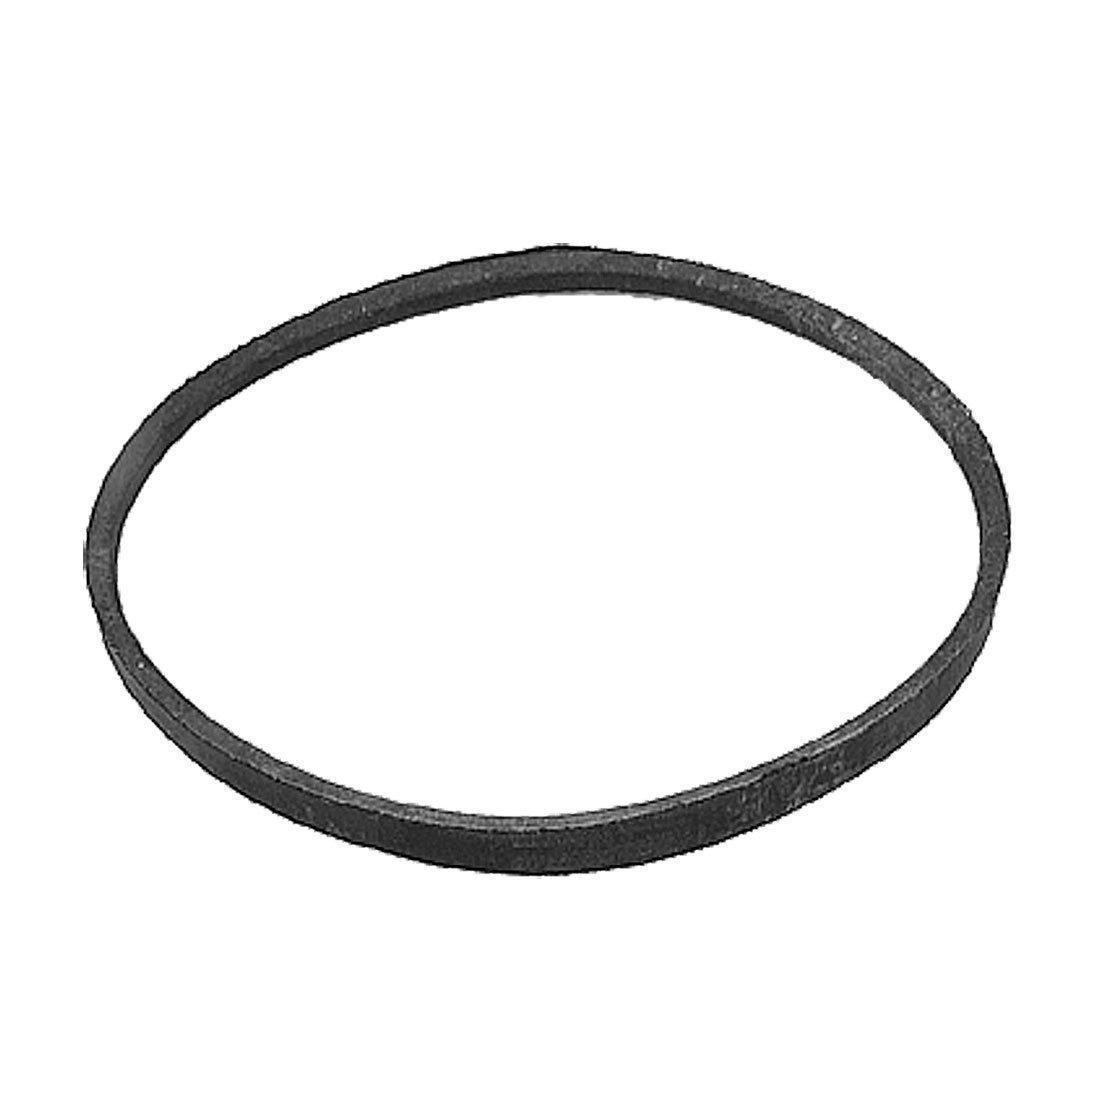 sourcingmap® Machine Transmission Pulley Black Rubber M Type Drive V Belt M25 a11110100ux0138